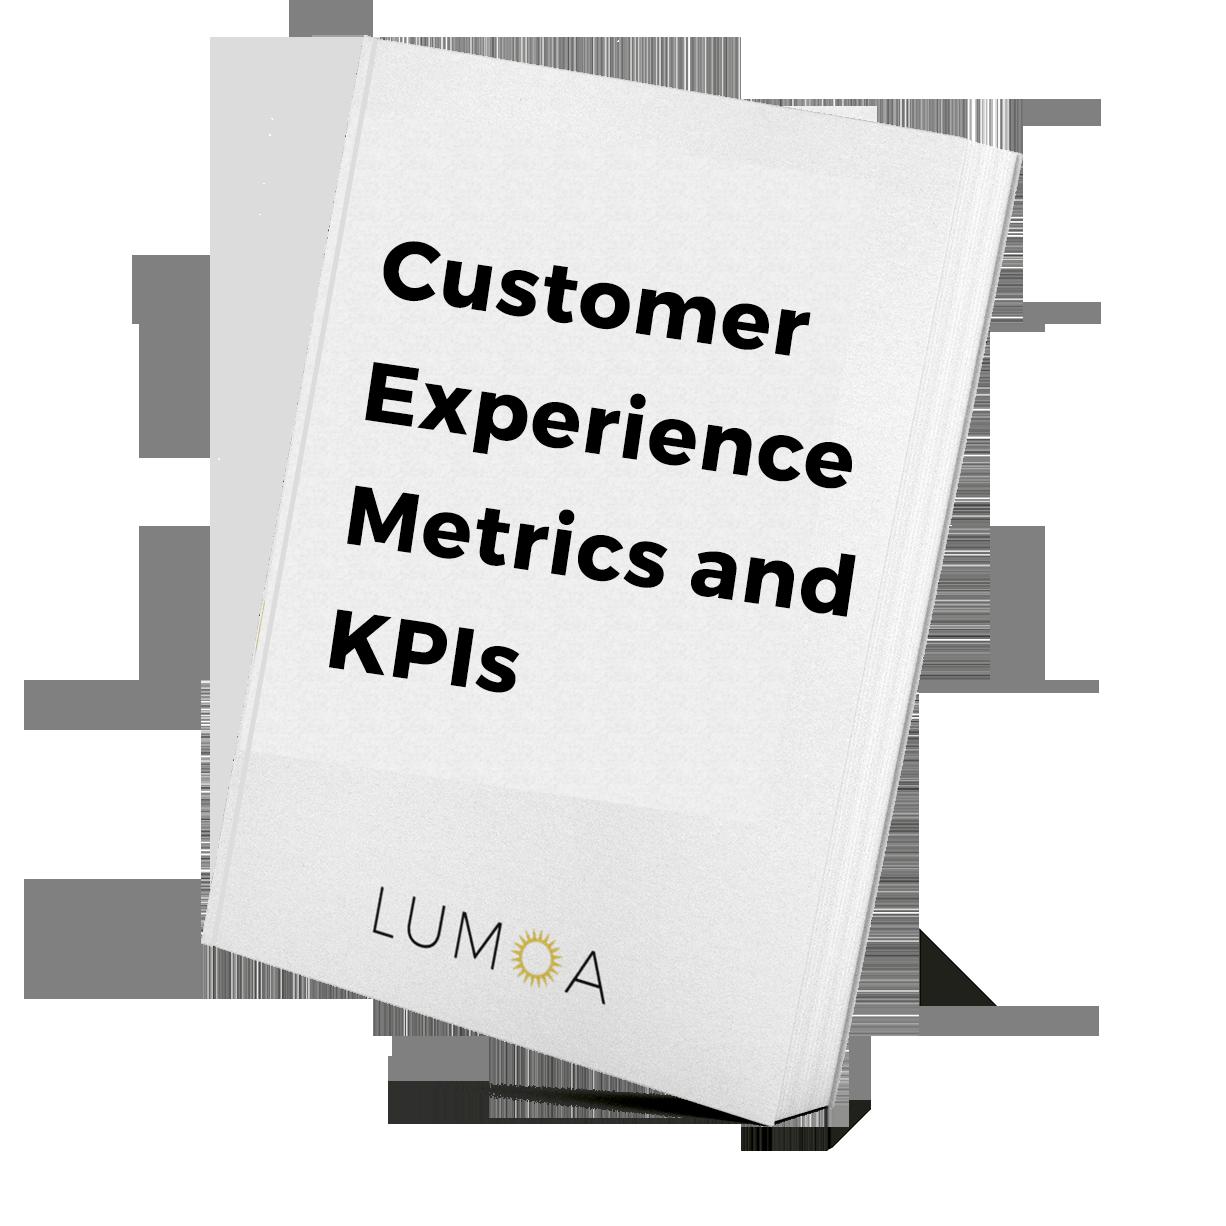 book_metrics and kpis.png